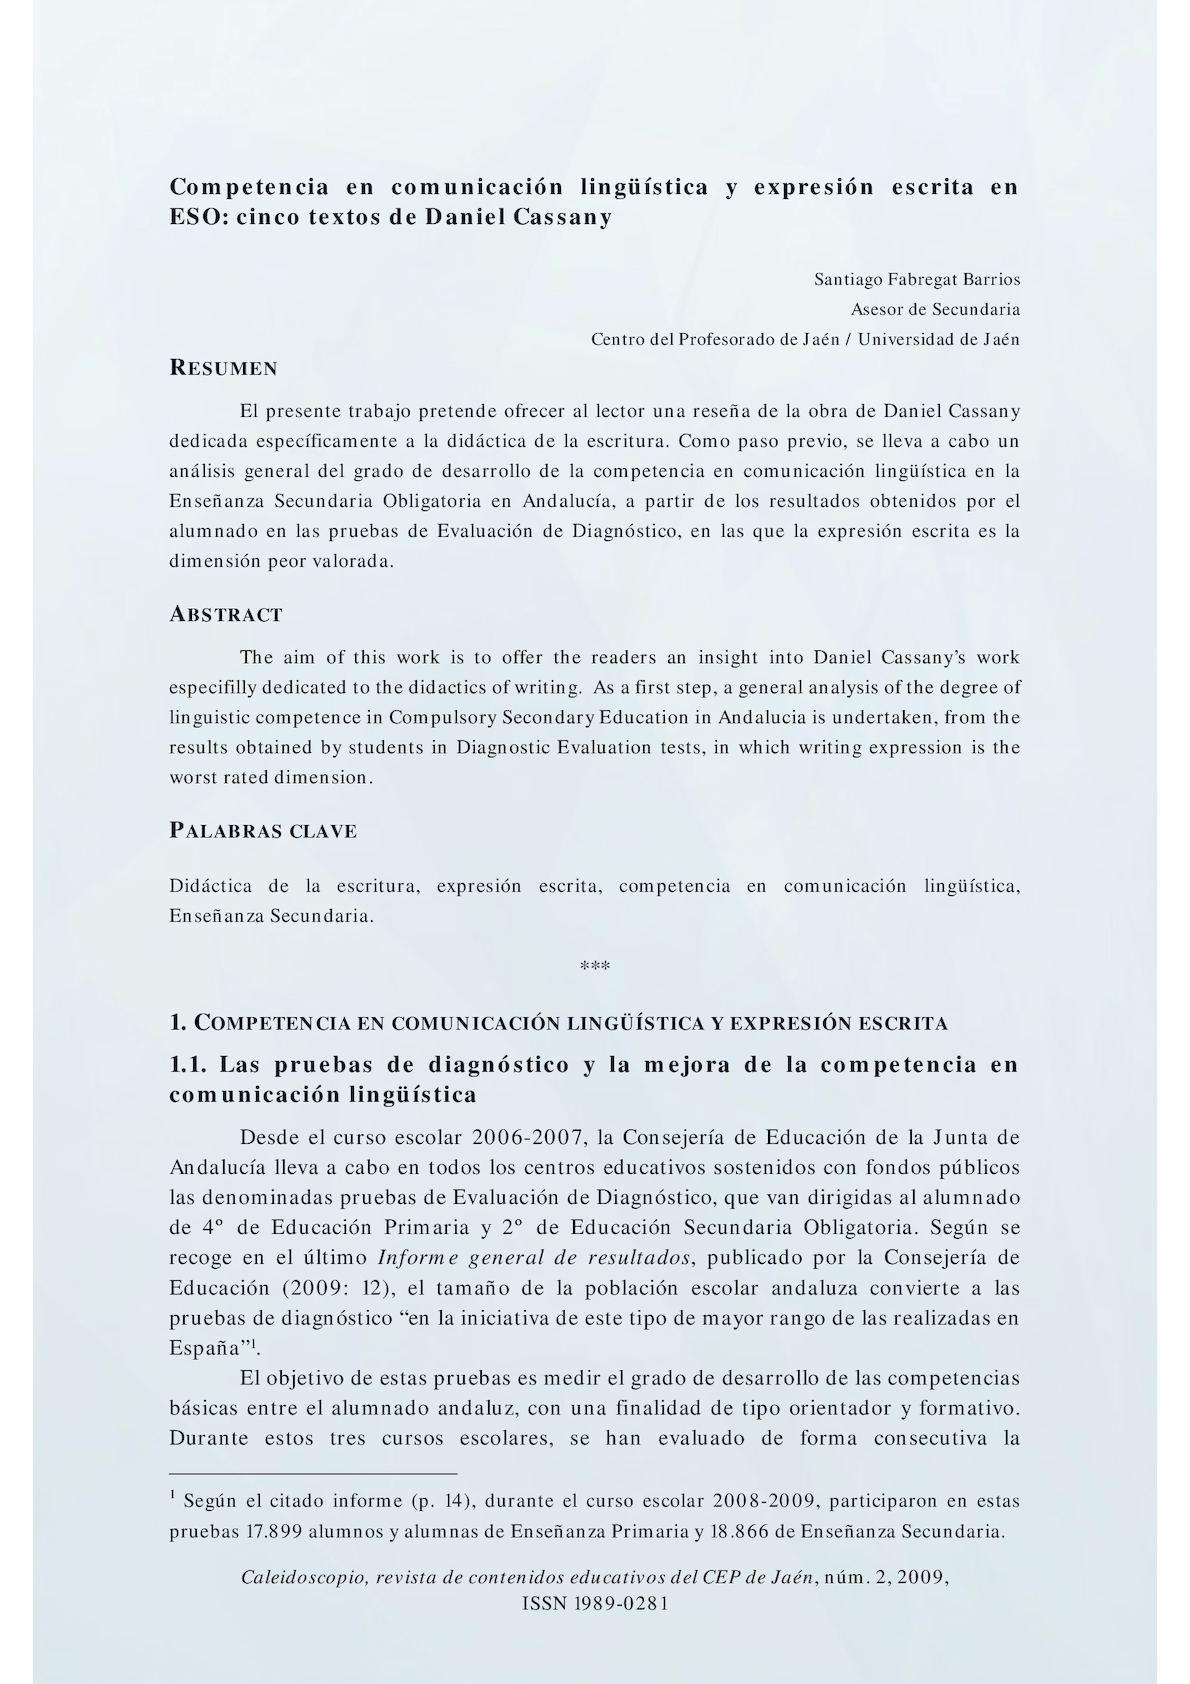 Calaméo - Dialnet Competencia Linguistica Yexpresion Escrita En Eso ...